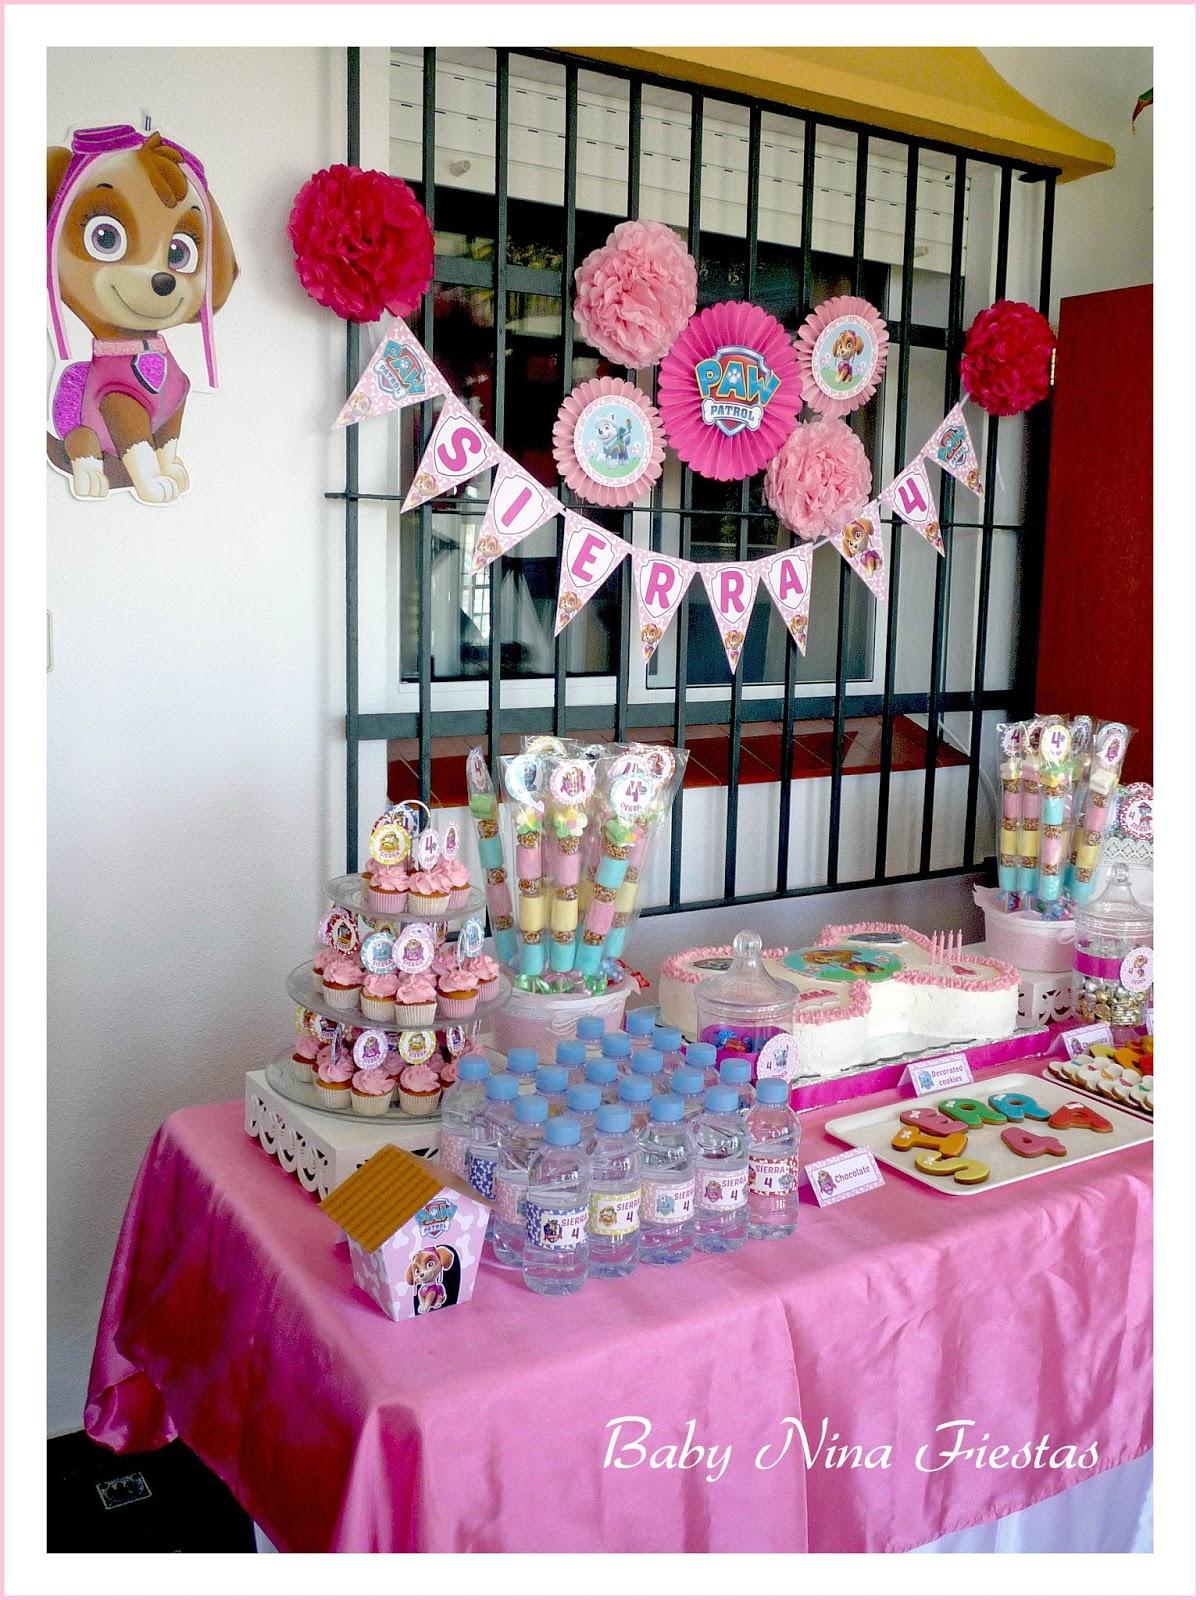 Baby nina fiestas mesa dulce skye patrulla canina para el - Mesas dulces para ninas ...